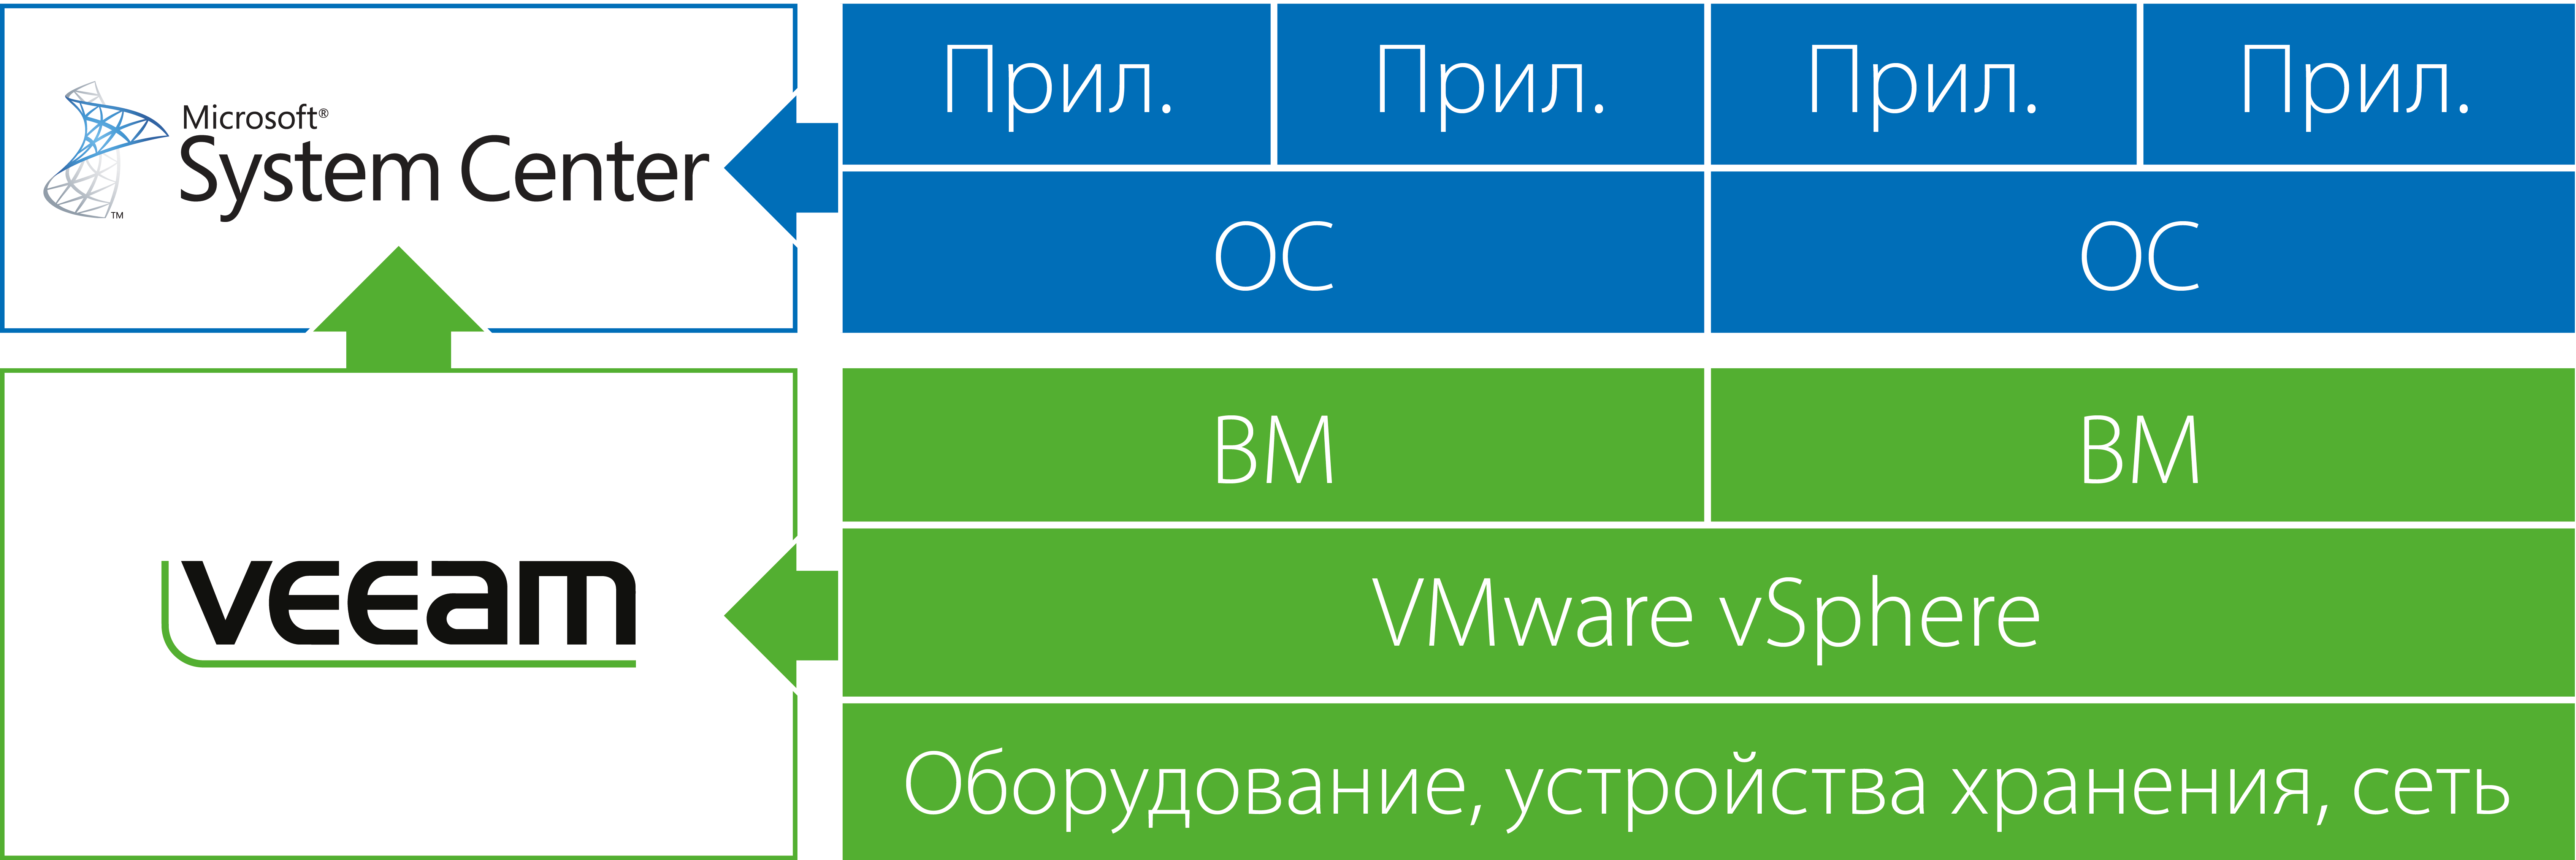 Для Microsoft System Center вышел Veeam Management Pack for VMware v6.5: что нового?